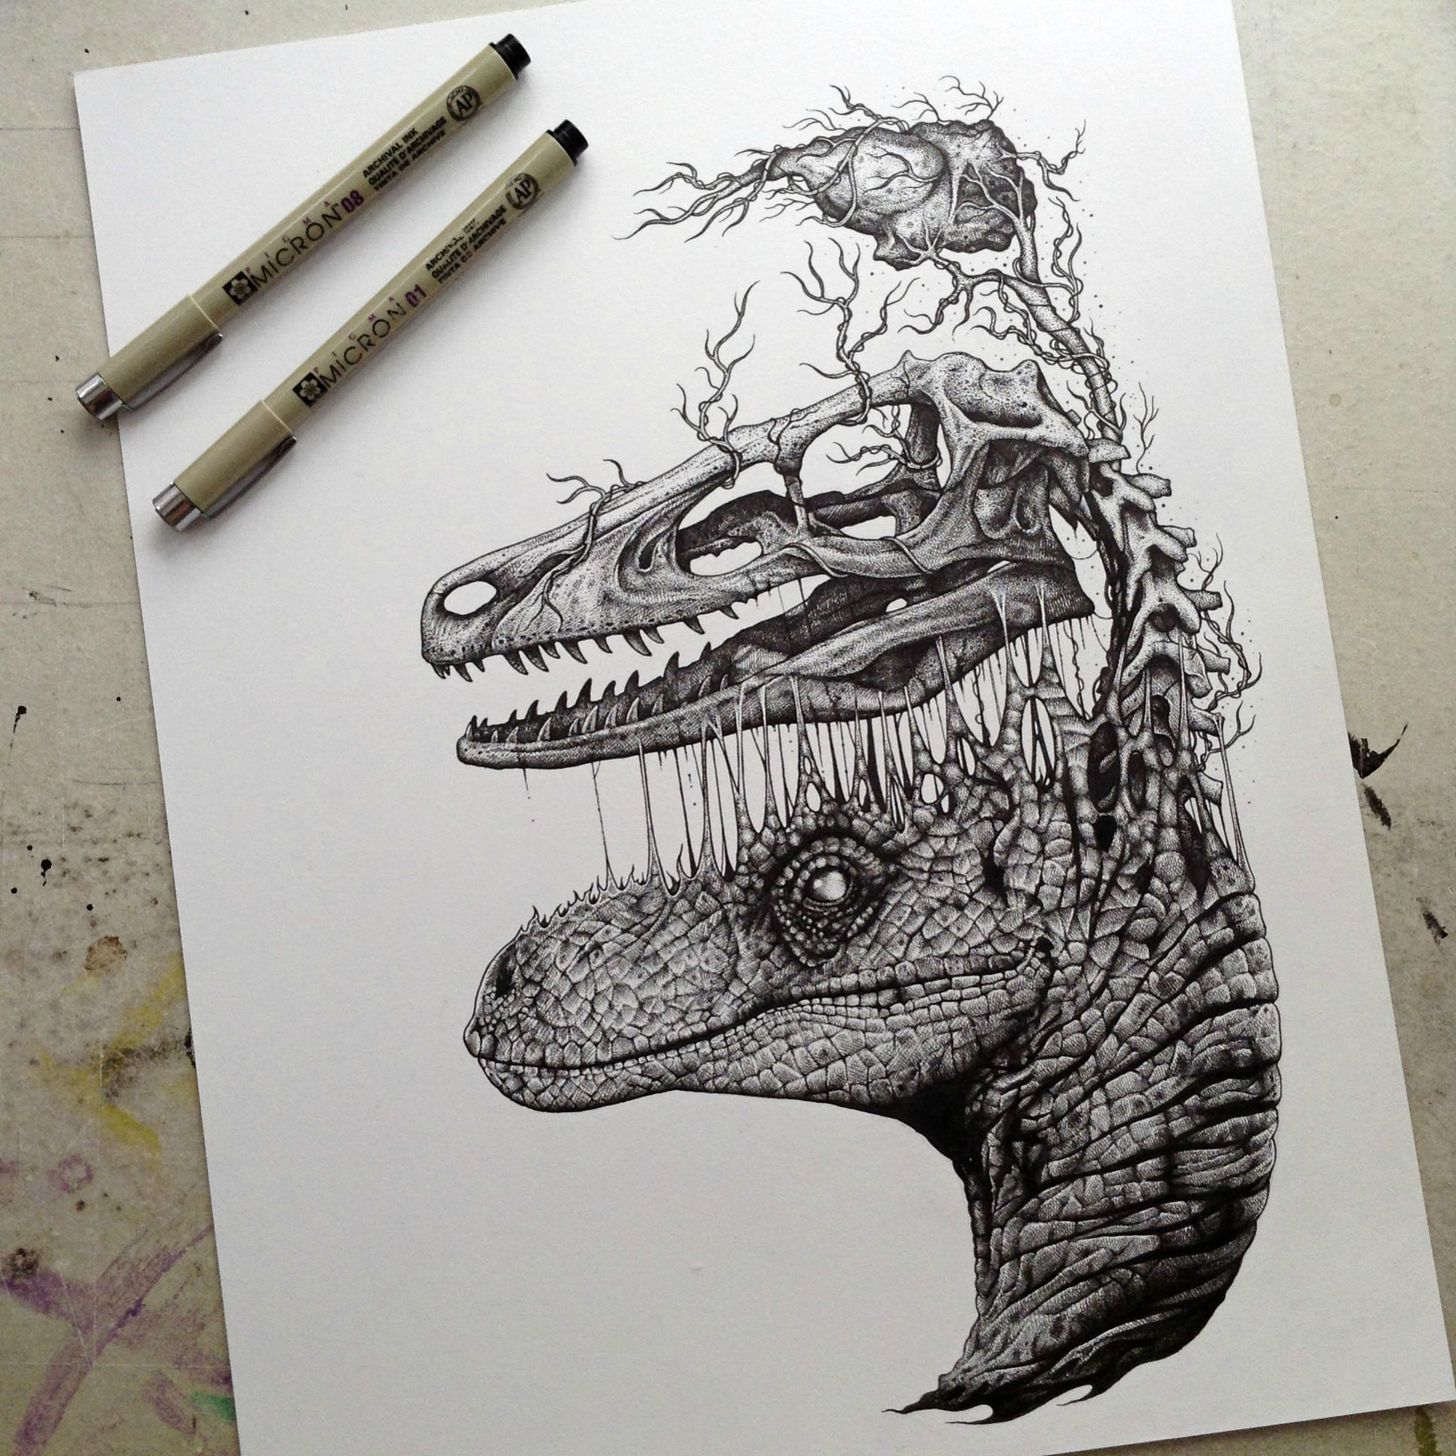 1456x1456 Raptor Skull And Brain Drawing Pics